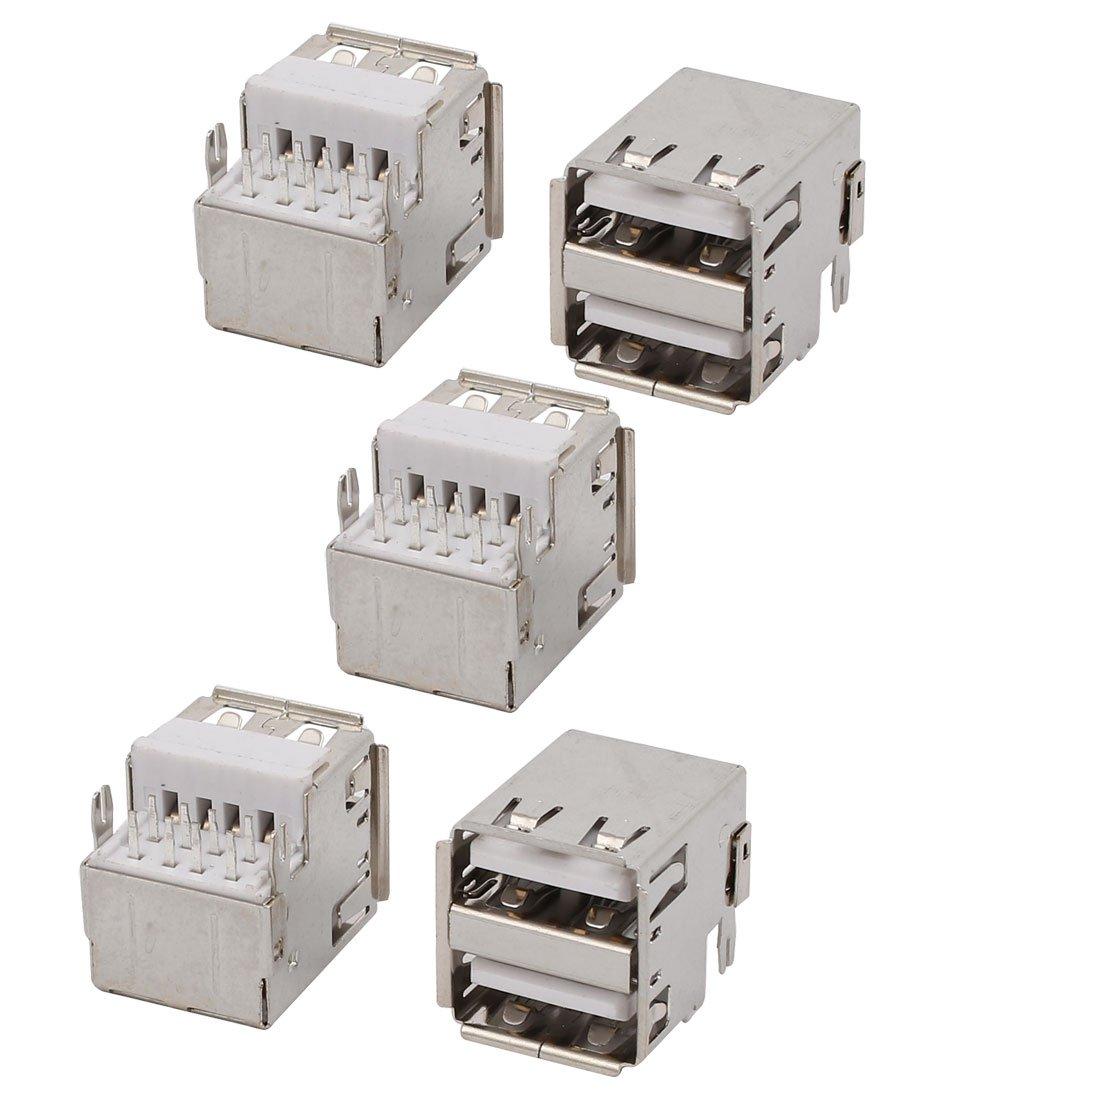 USB Female Type-A 2.0 Jack 8-Terminal 180 Degree PCB Socket Connector 5pcs